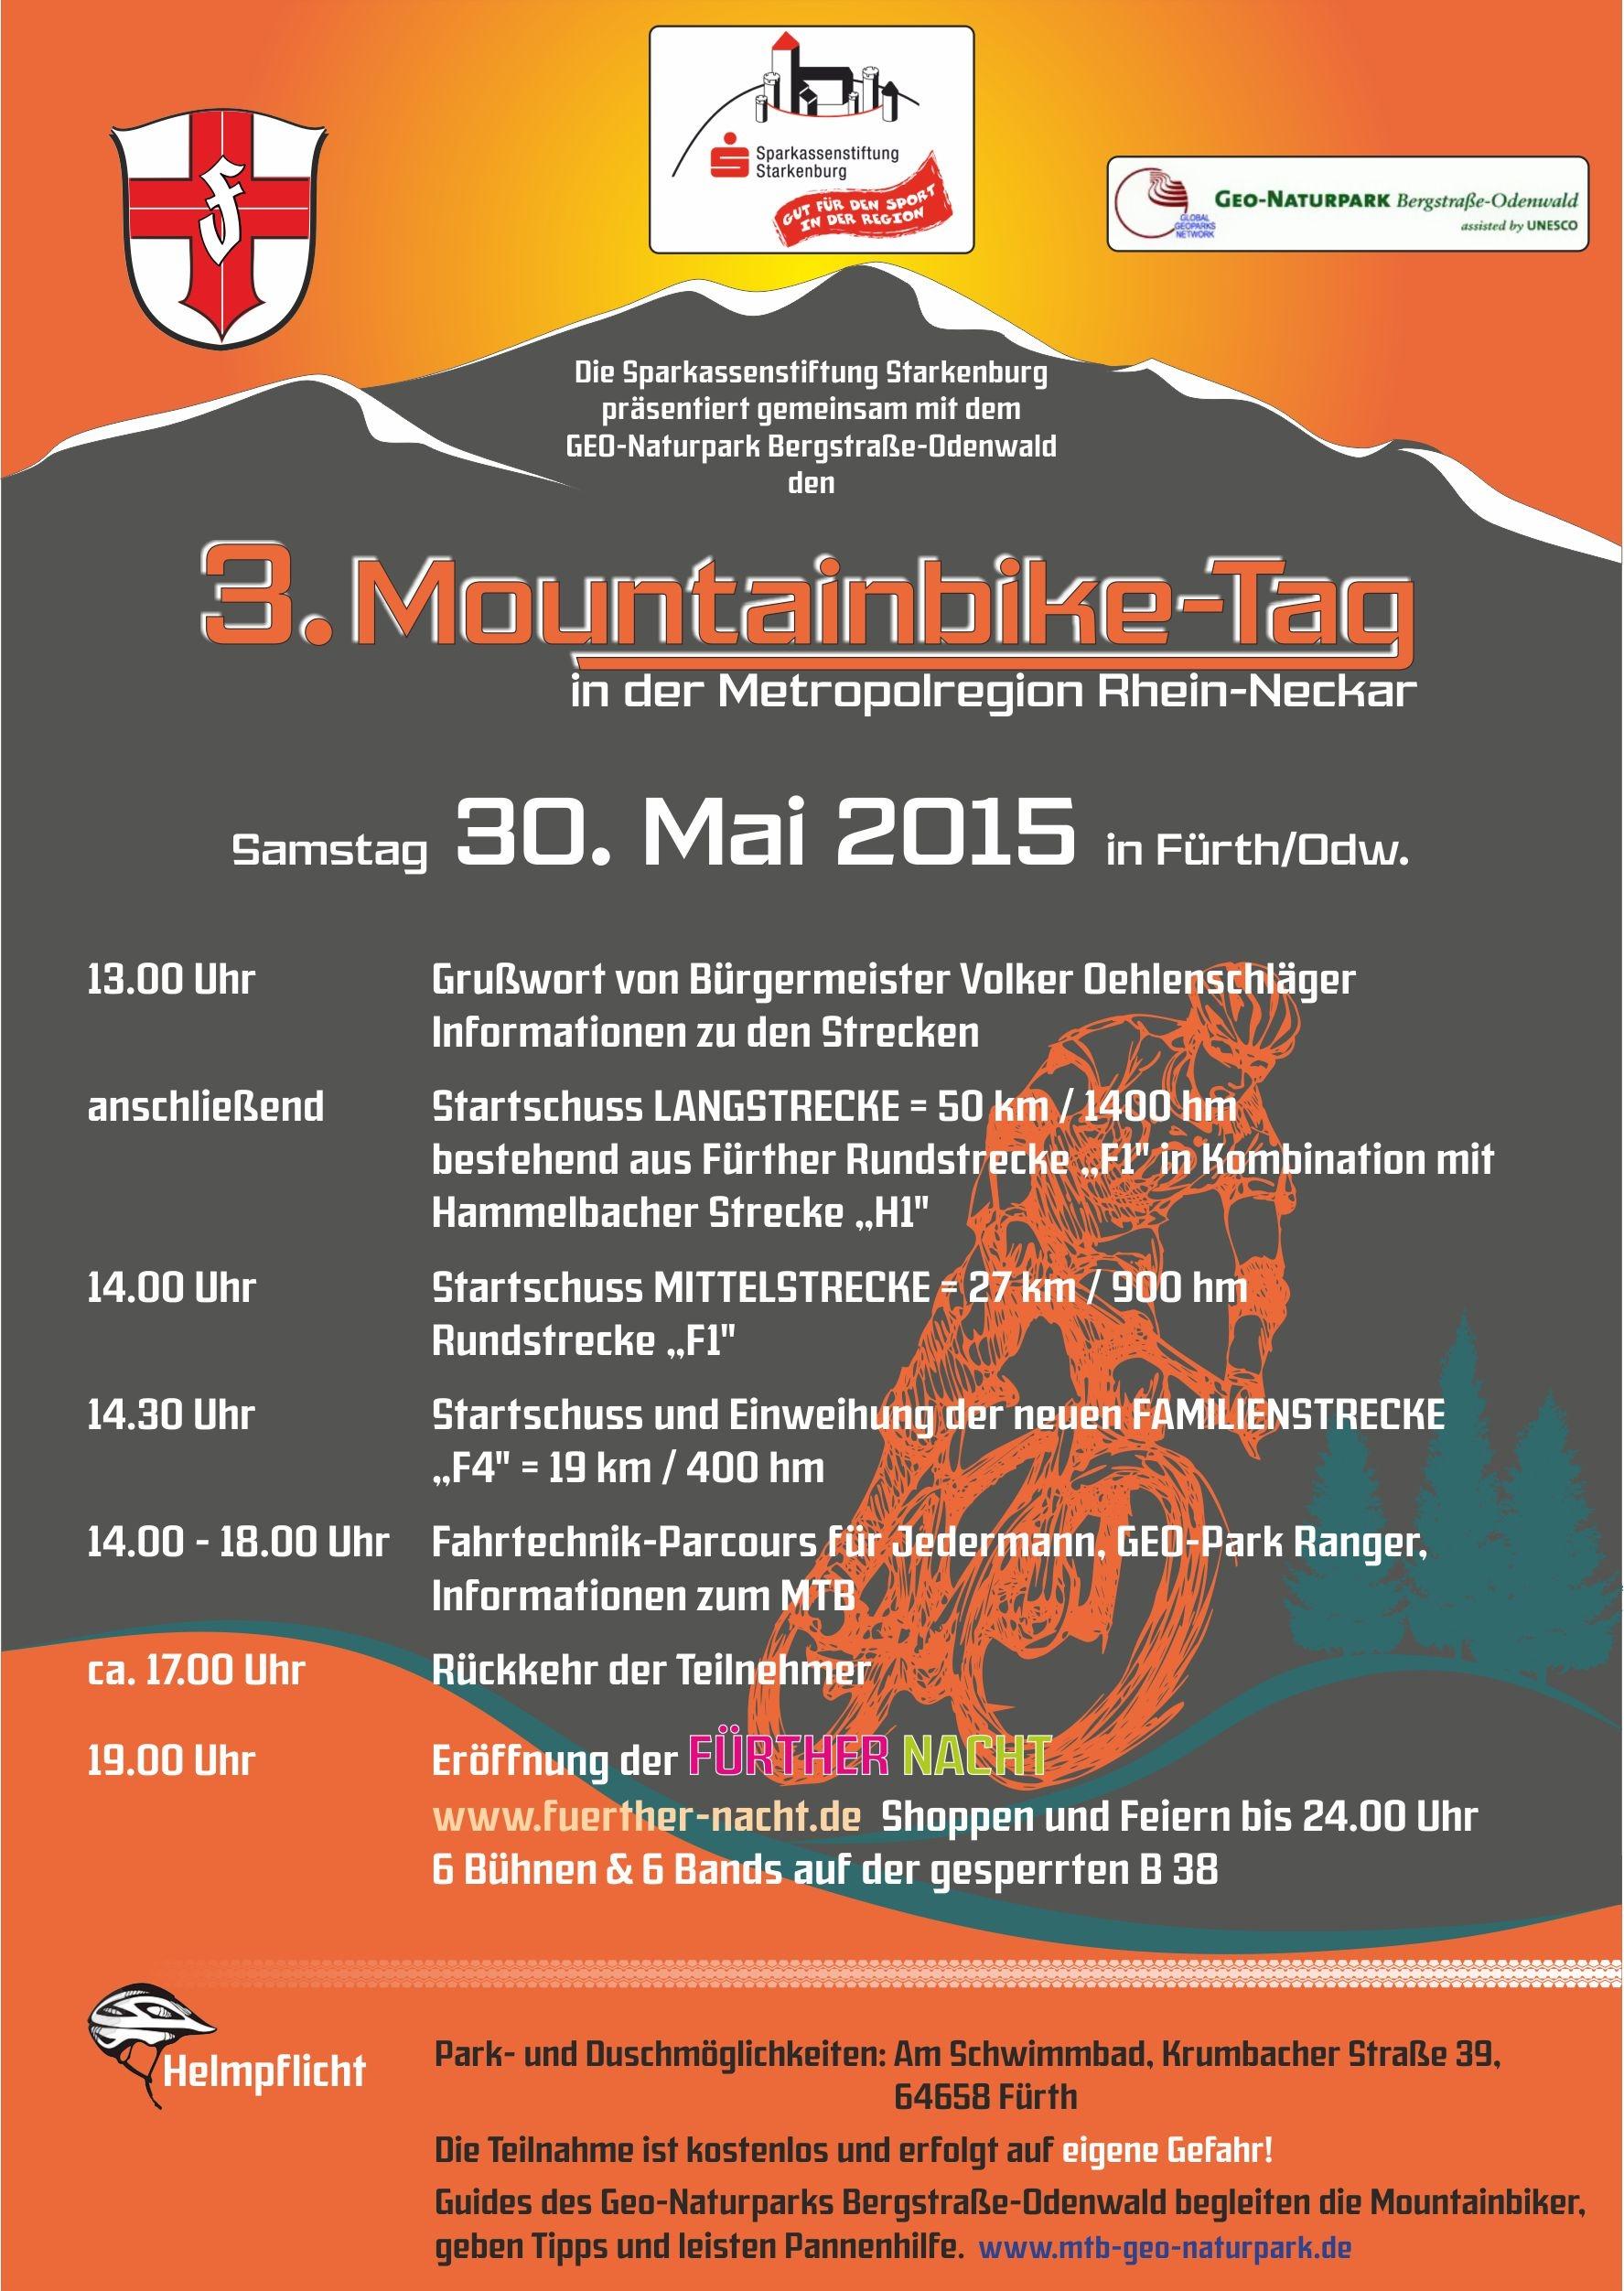 Flyer Mountainbike-Tag 2015